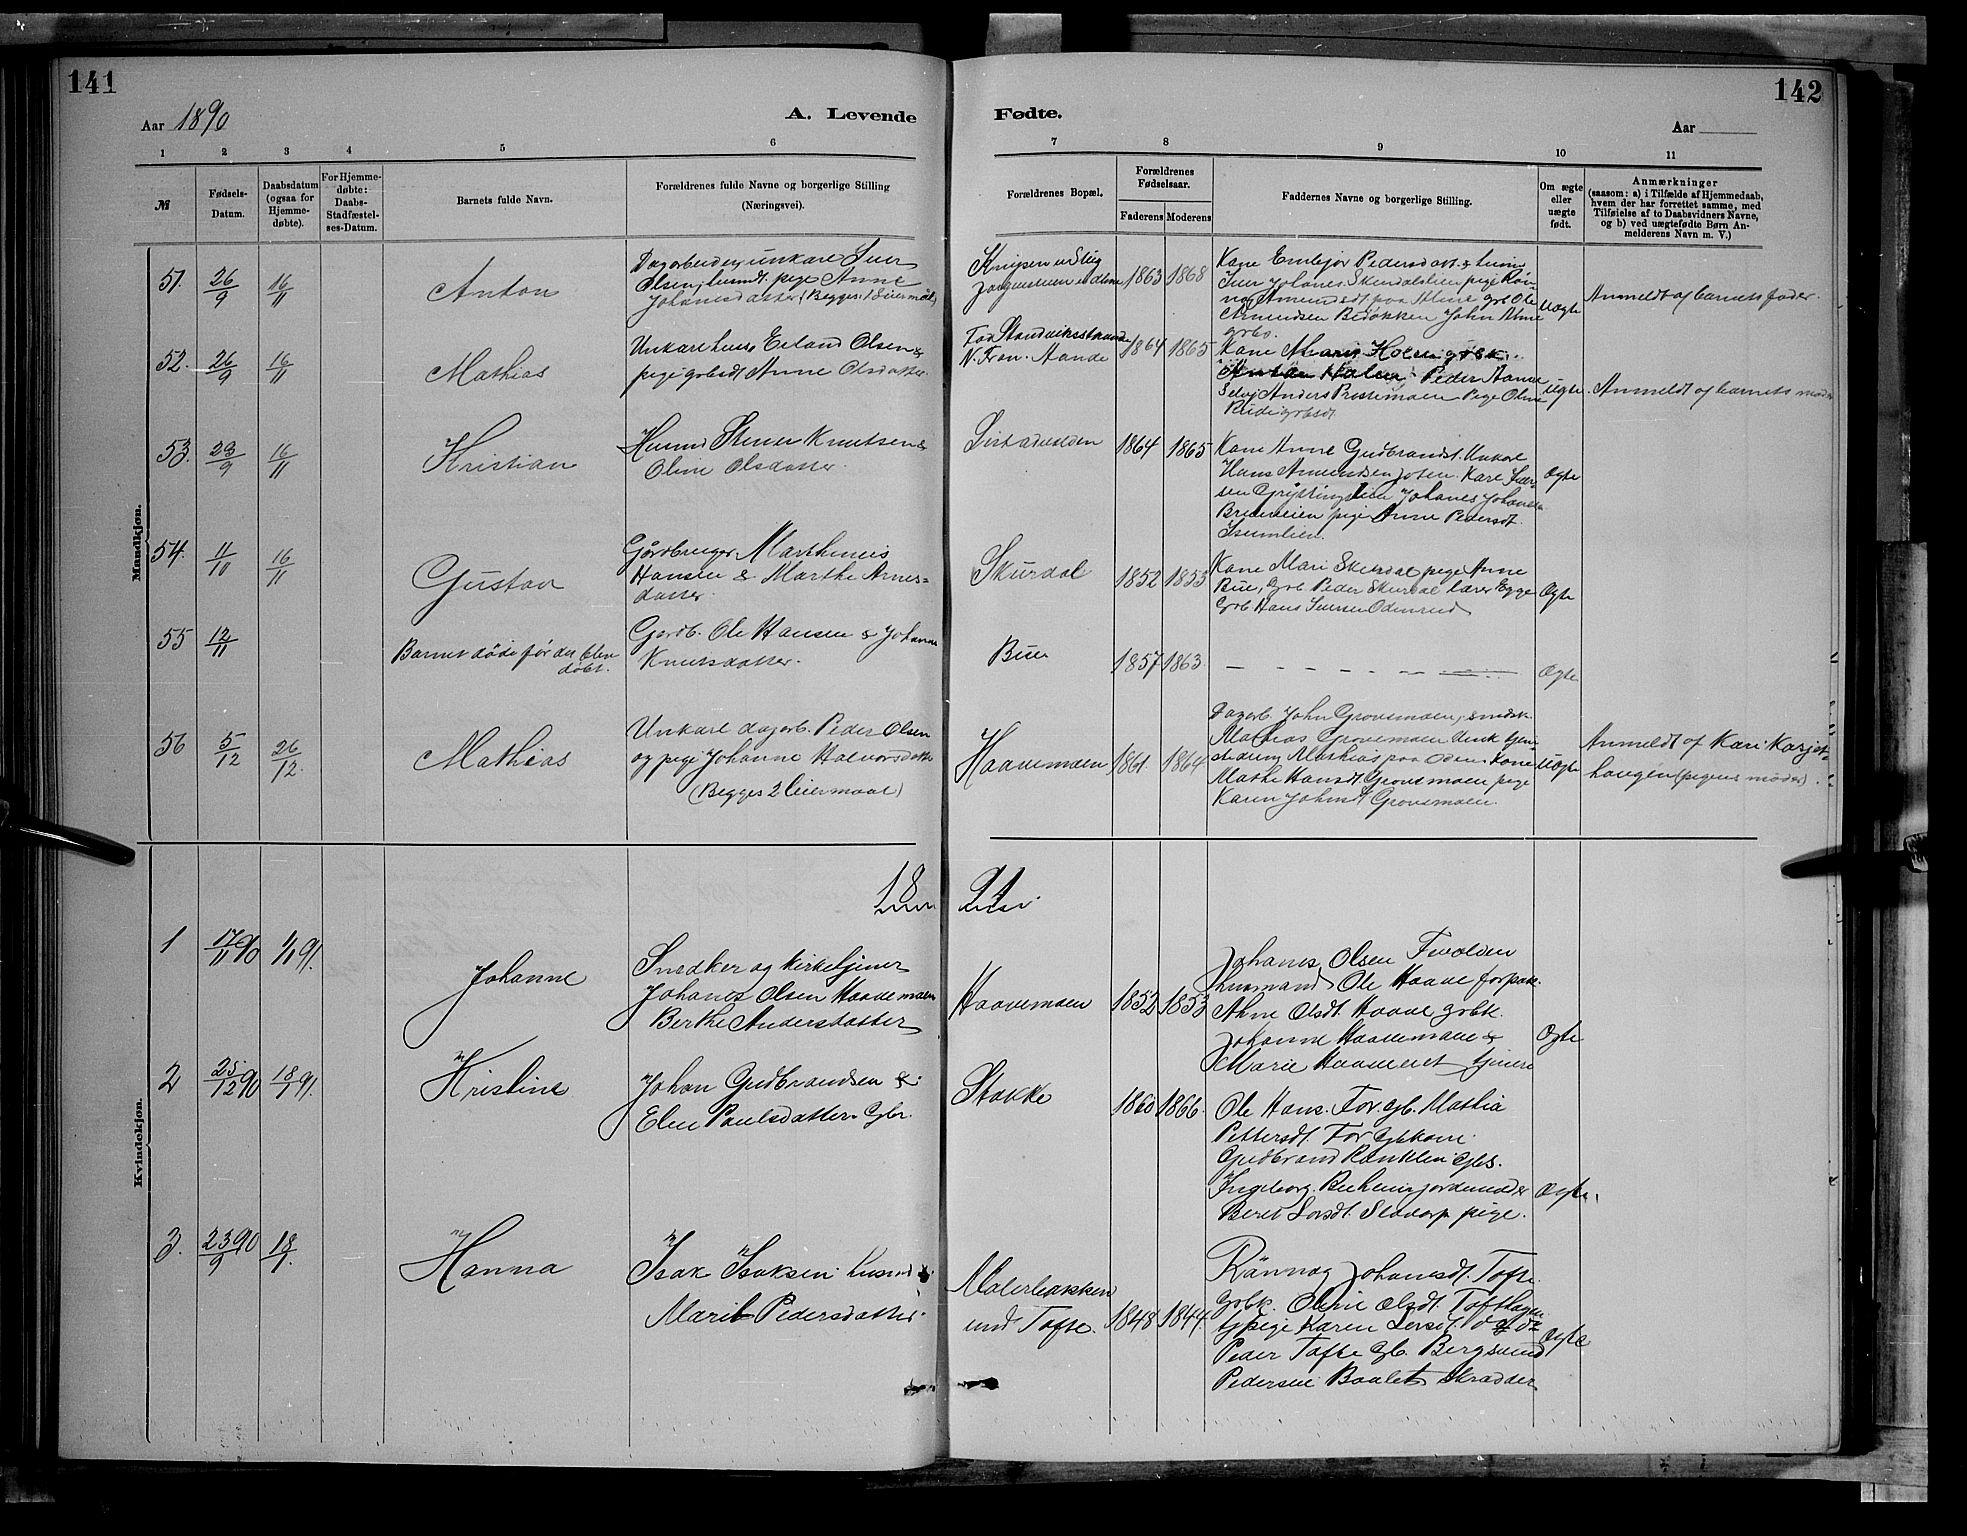 SAH, Sør-Fron prestekontor, H/Ha/Hab/L0003: Klokkerbok nr. 3, 1884-1896, s. 141-142